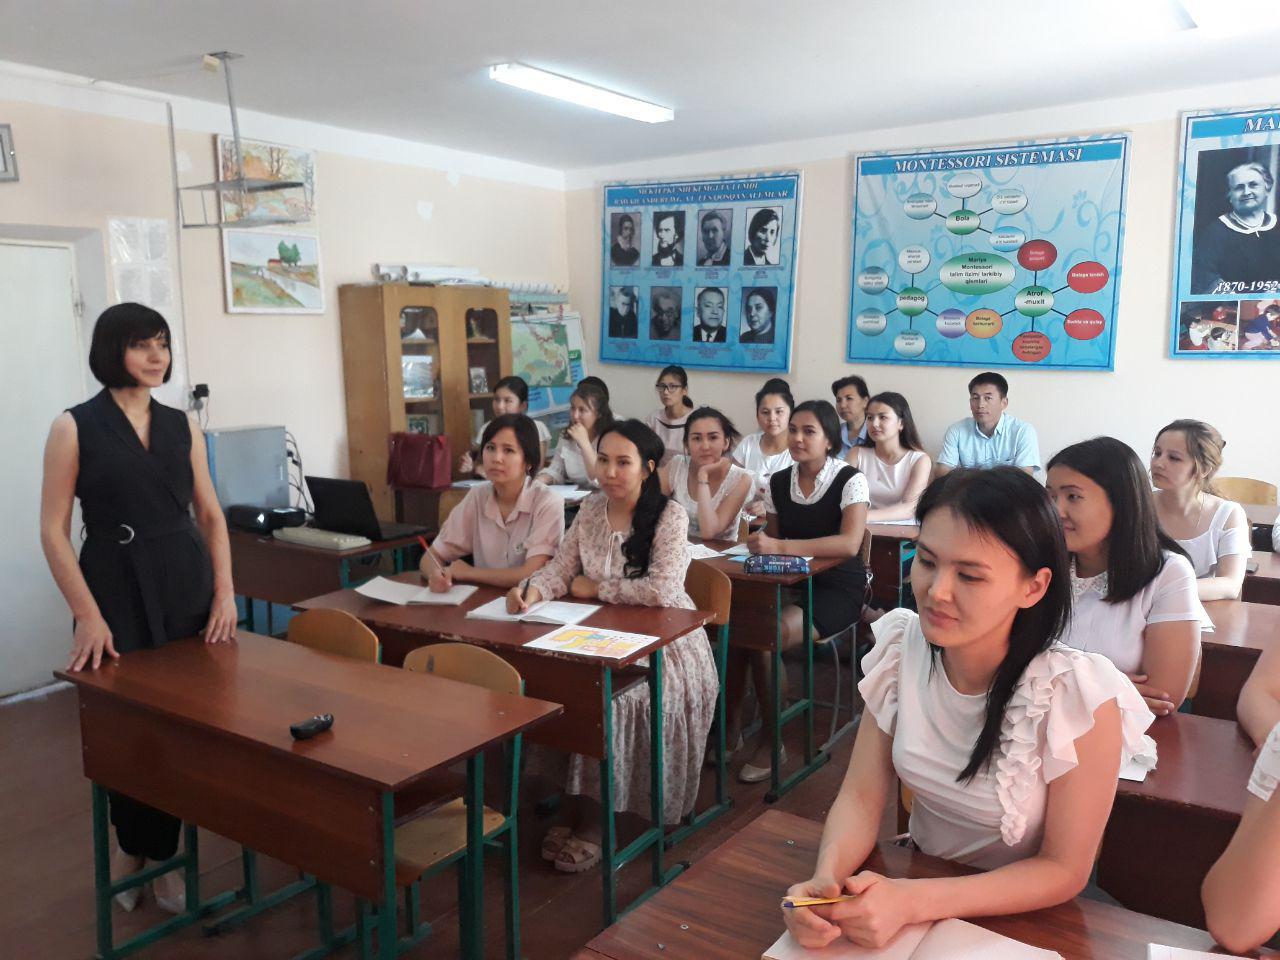 photo 2019 05 21 13 11 04 - Семинар-тренинг для студентов